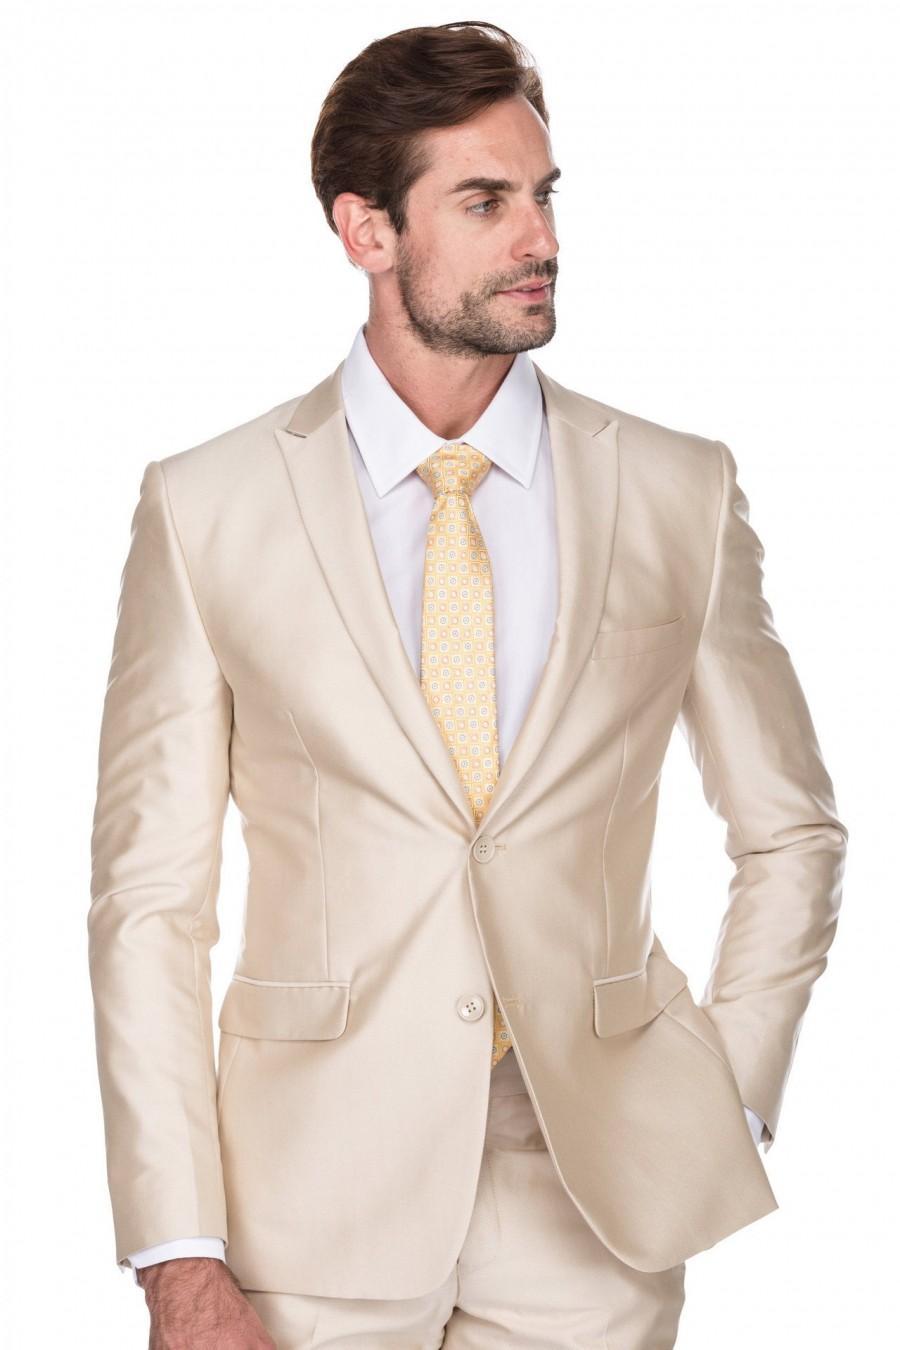 Wedding - Porto Filo 2-Piece Textured Champagne Color Men's Slim Fit Wedding Suit